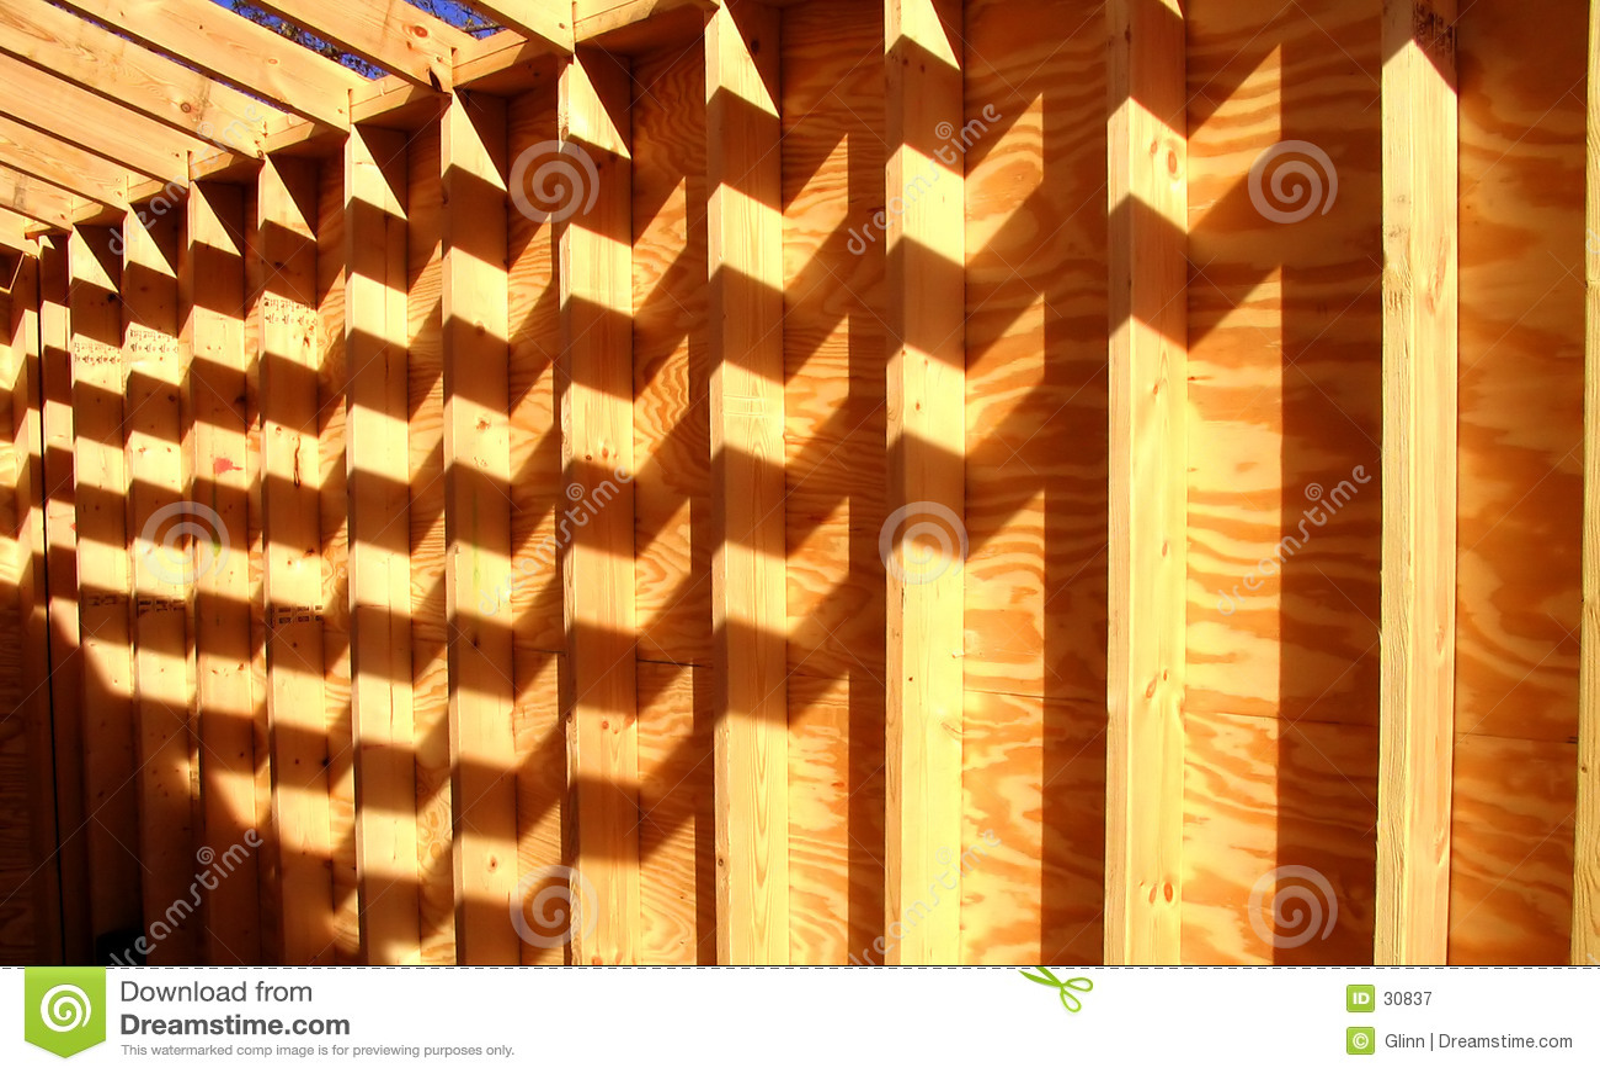 Construction Art